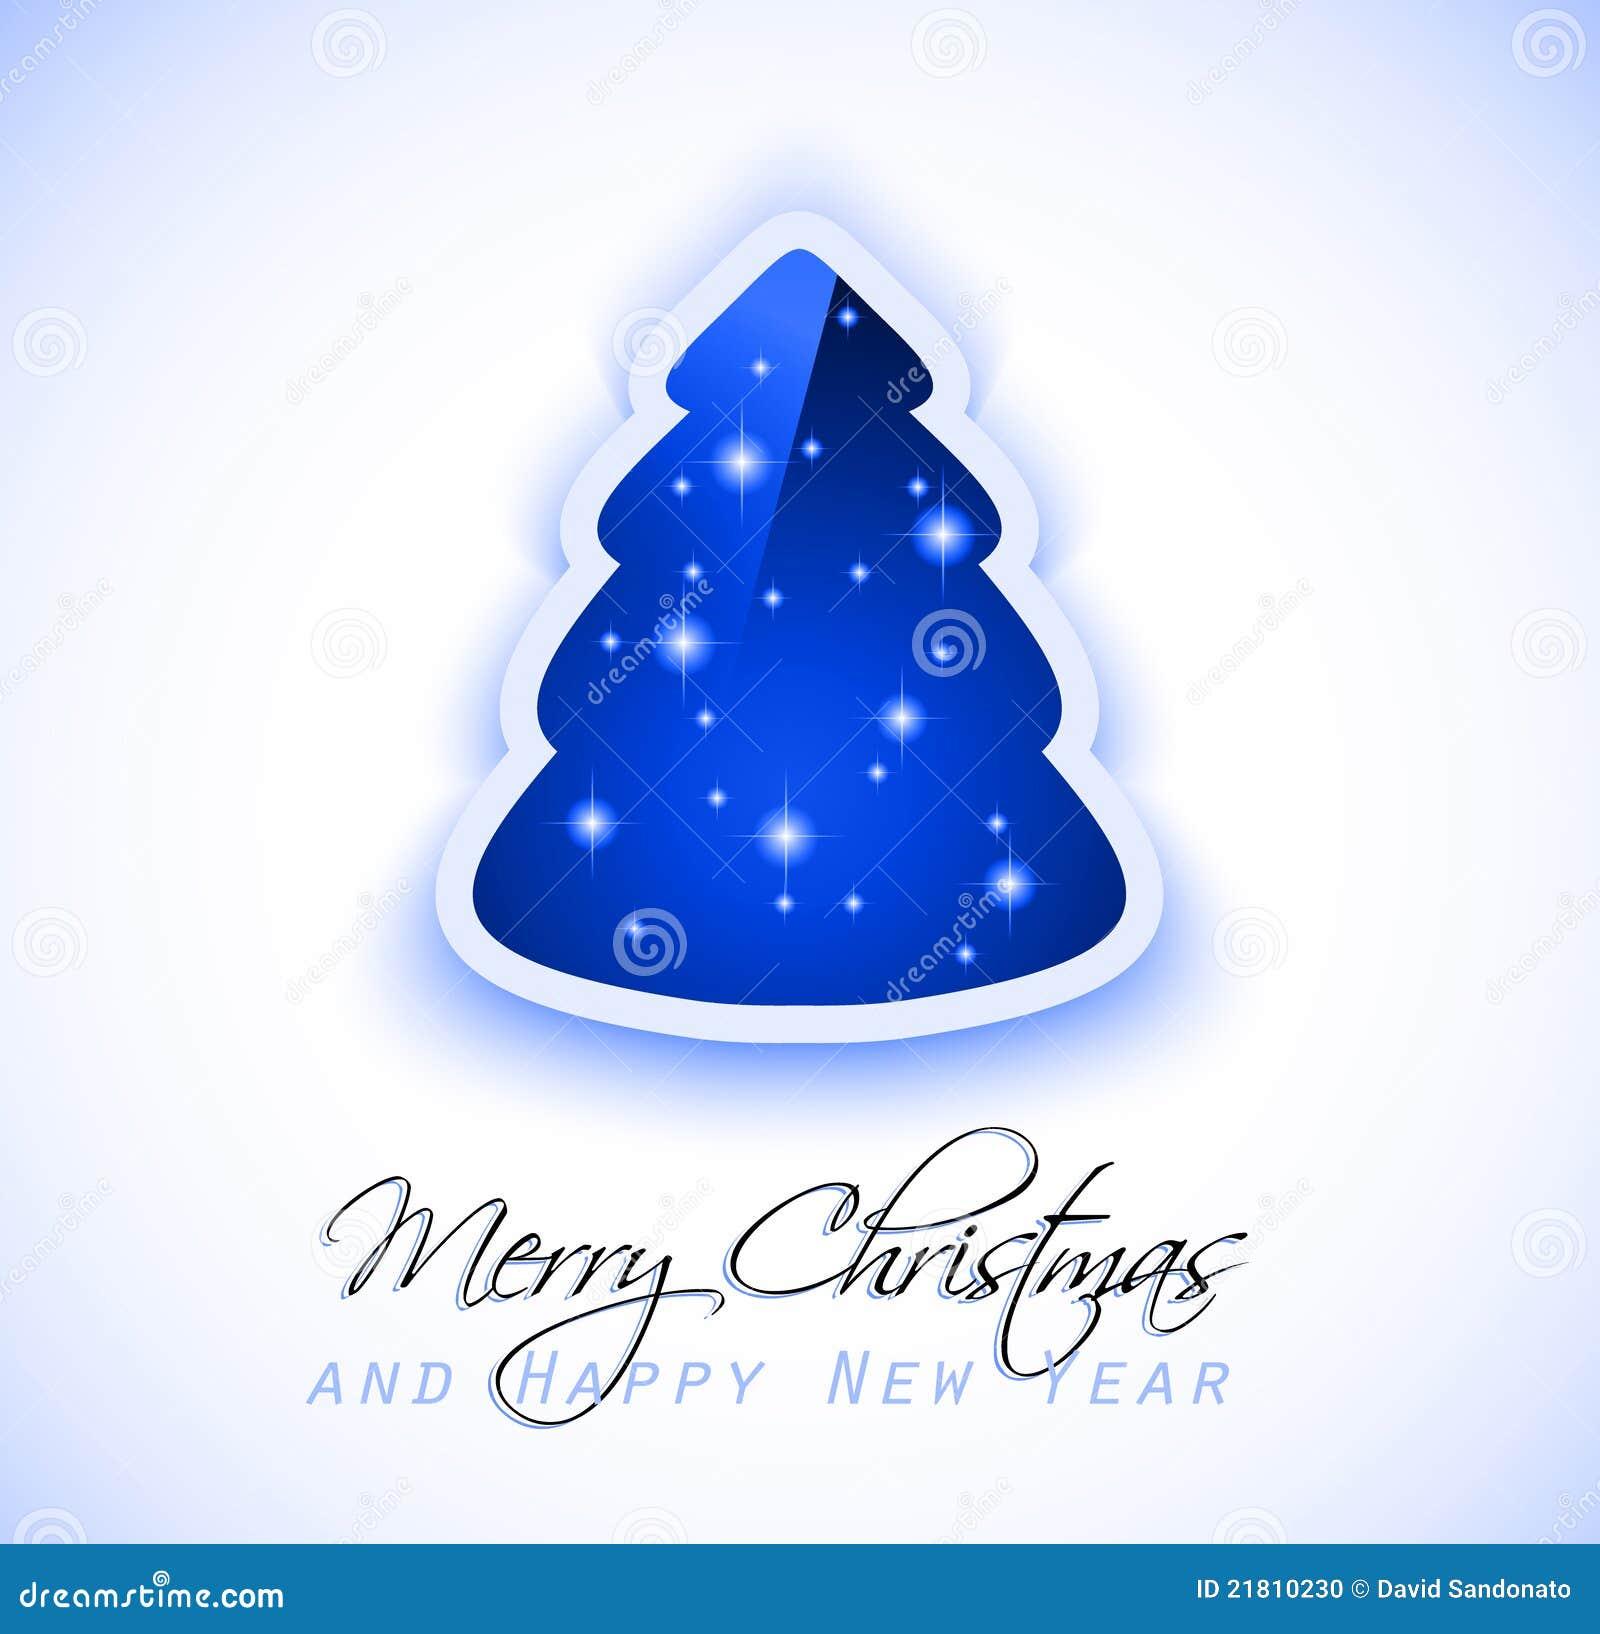 Elegant classic christmas greetings stock vector illustration of elegant classic christmas greetings m4hsunfo